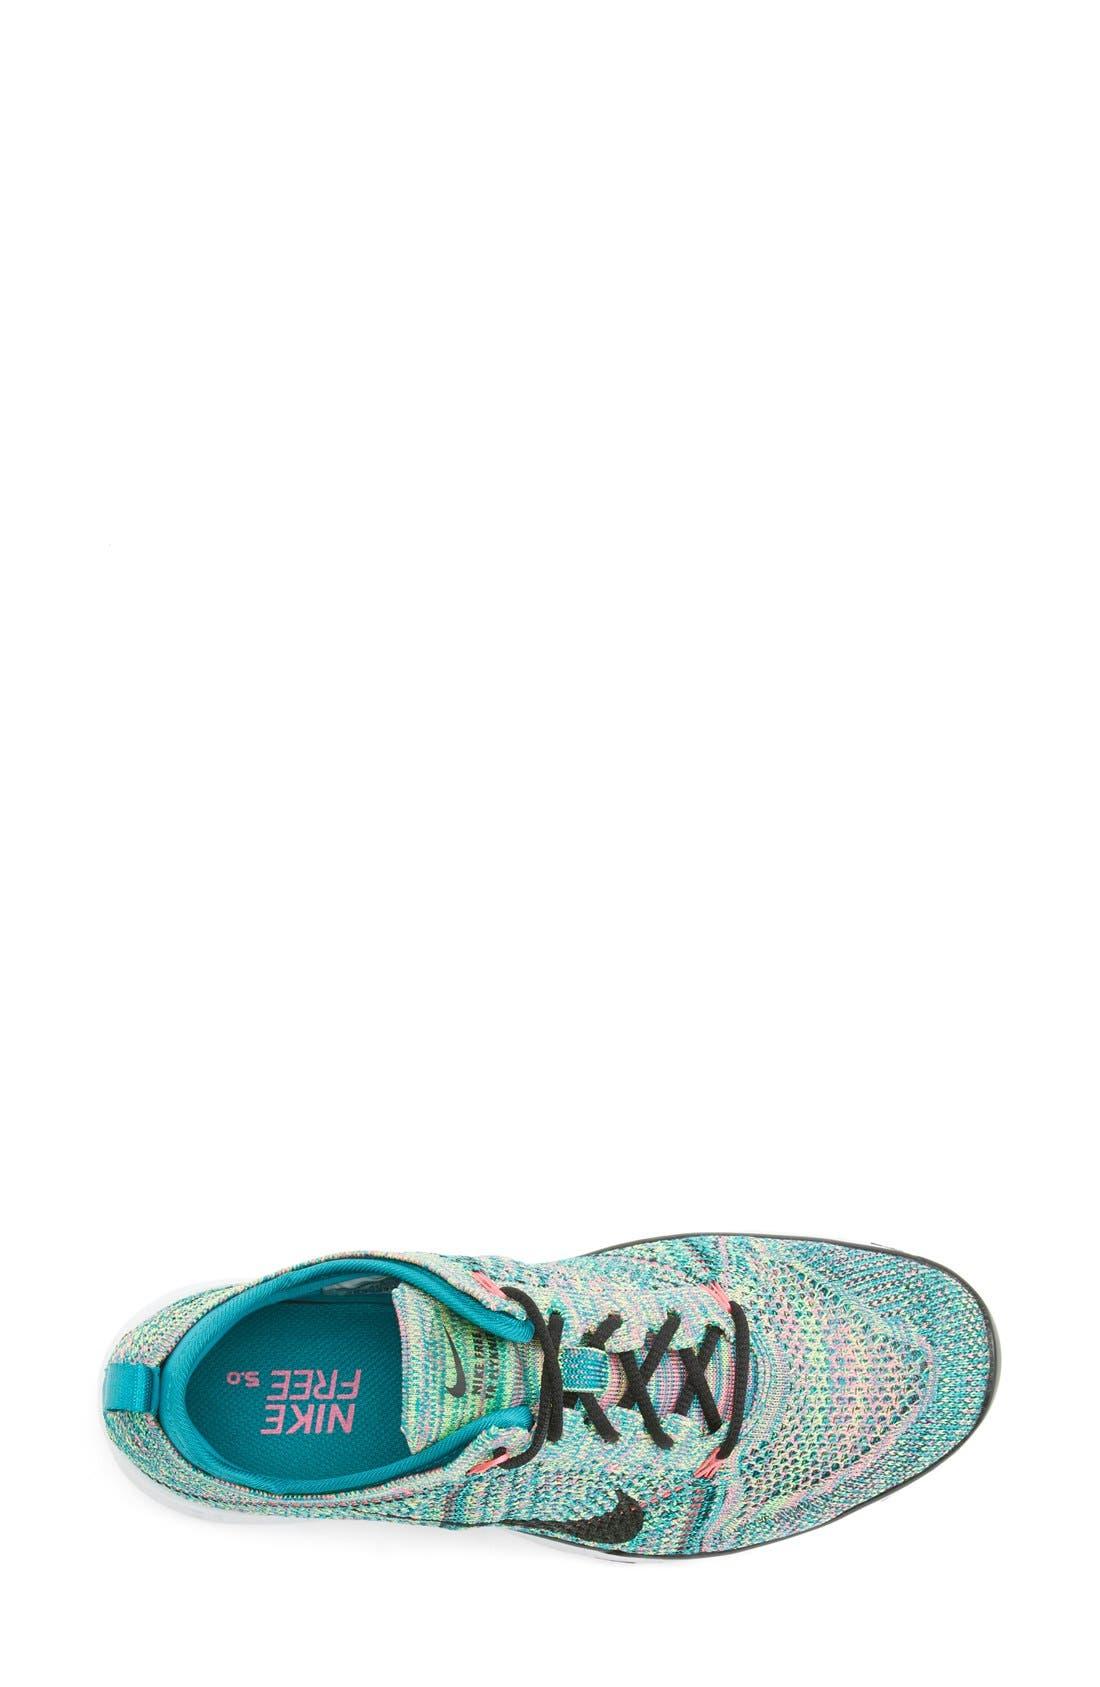 ,                             'Free Flyknit 5.0 TR' Training Shoe,                             Alternate thumbnail 18, color,                             300